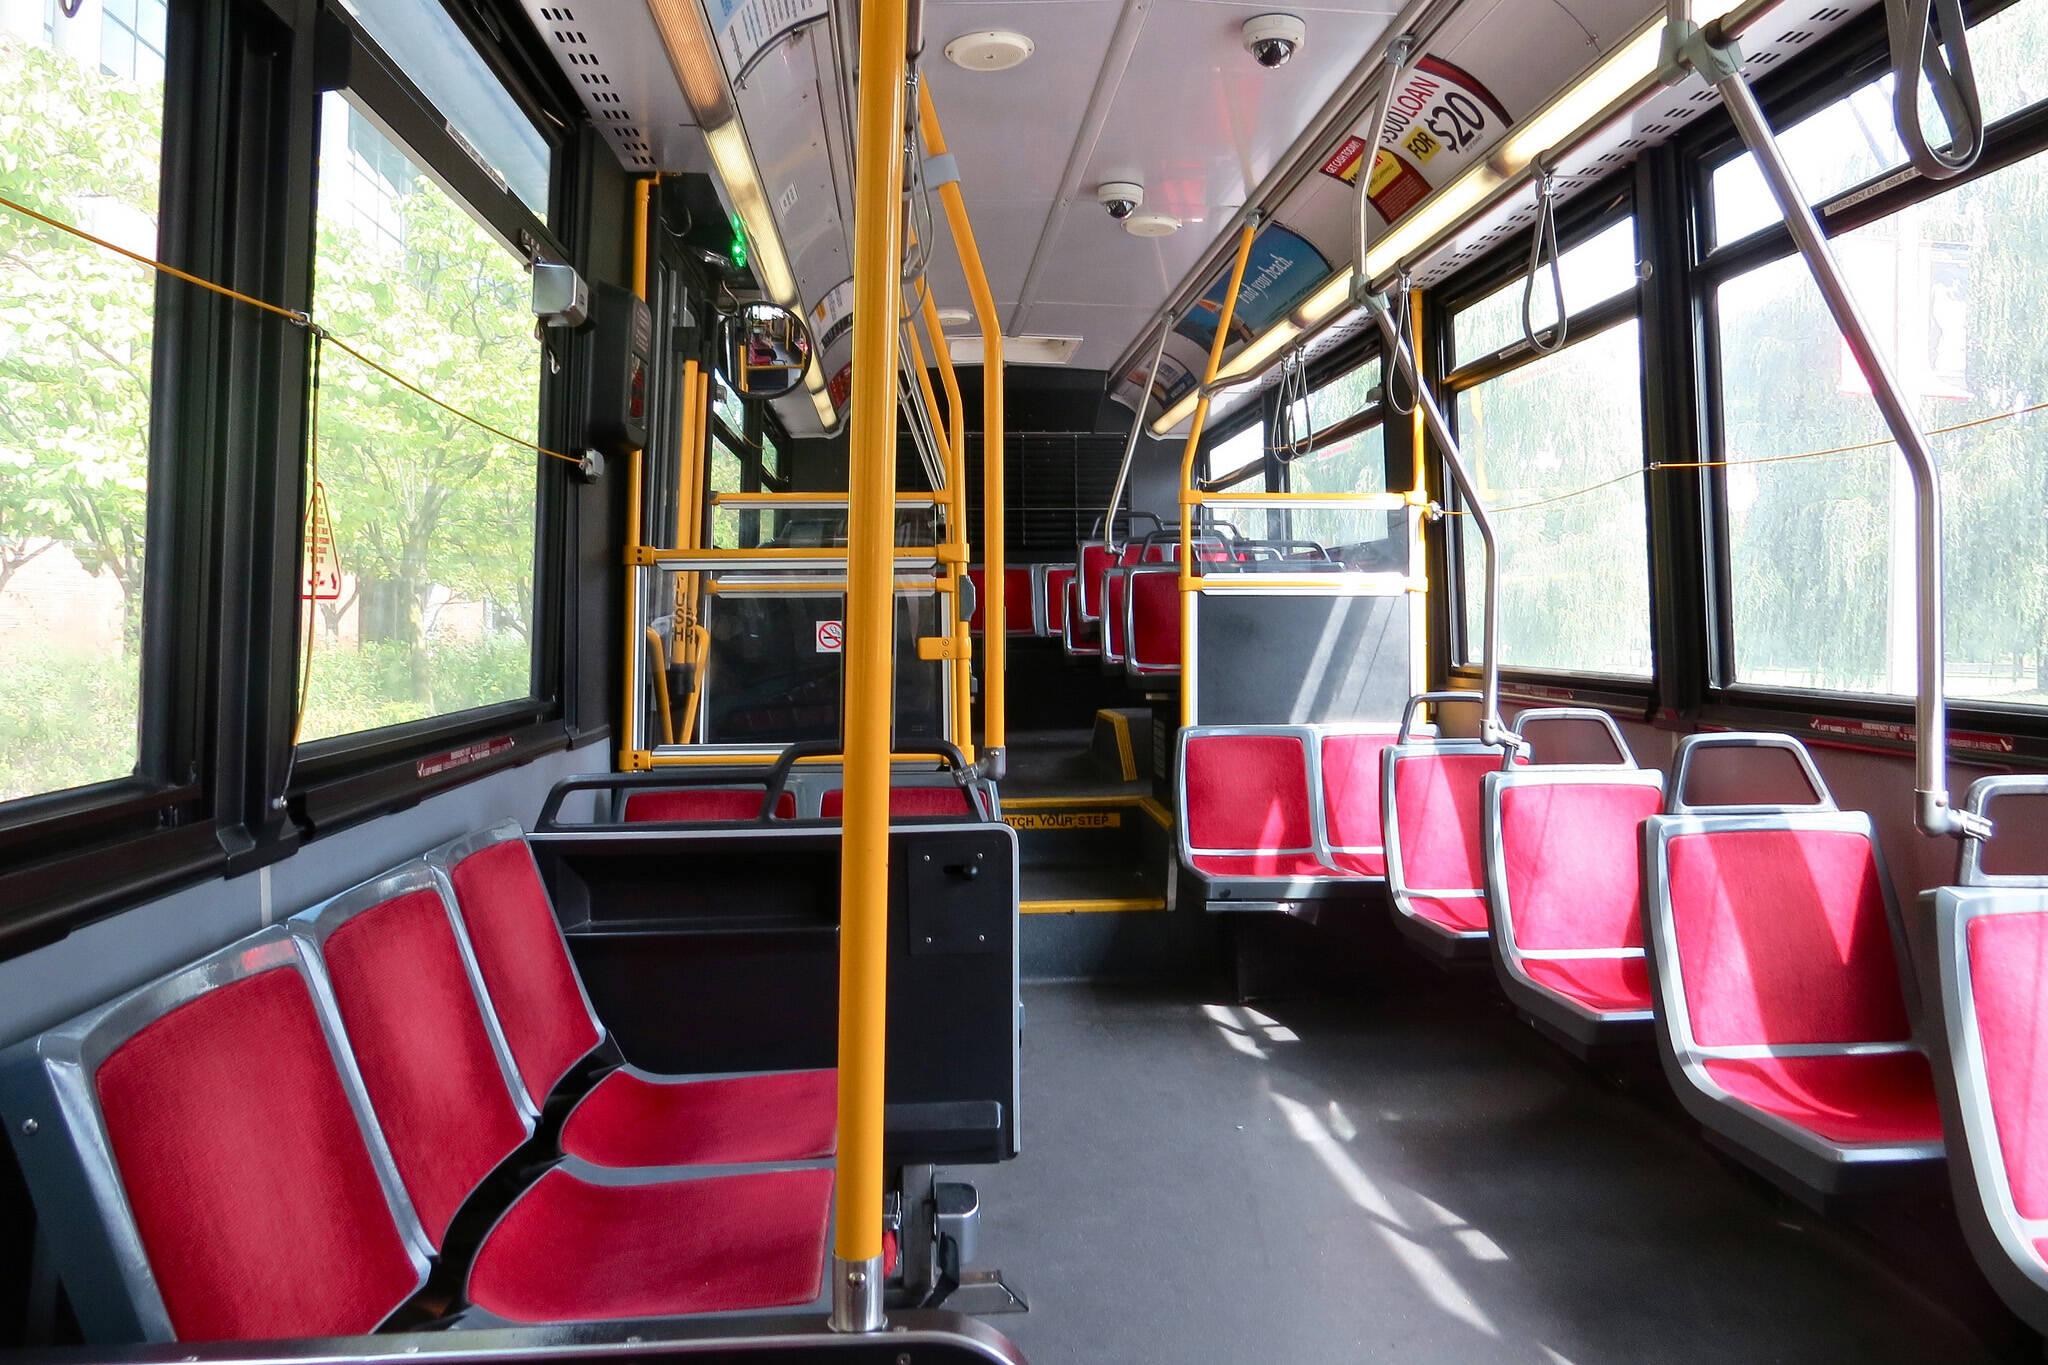 TTC high bus seat